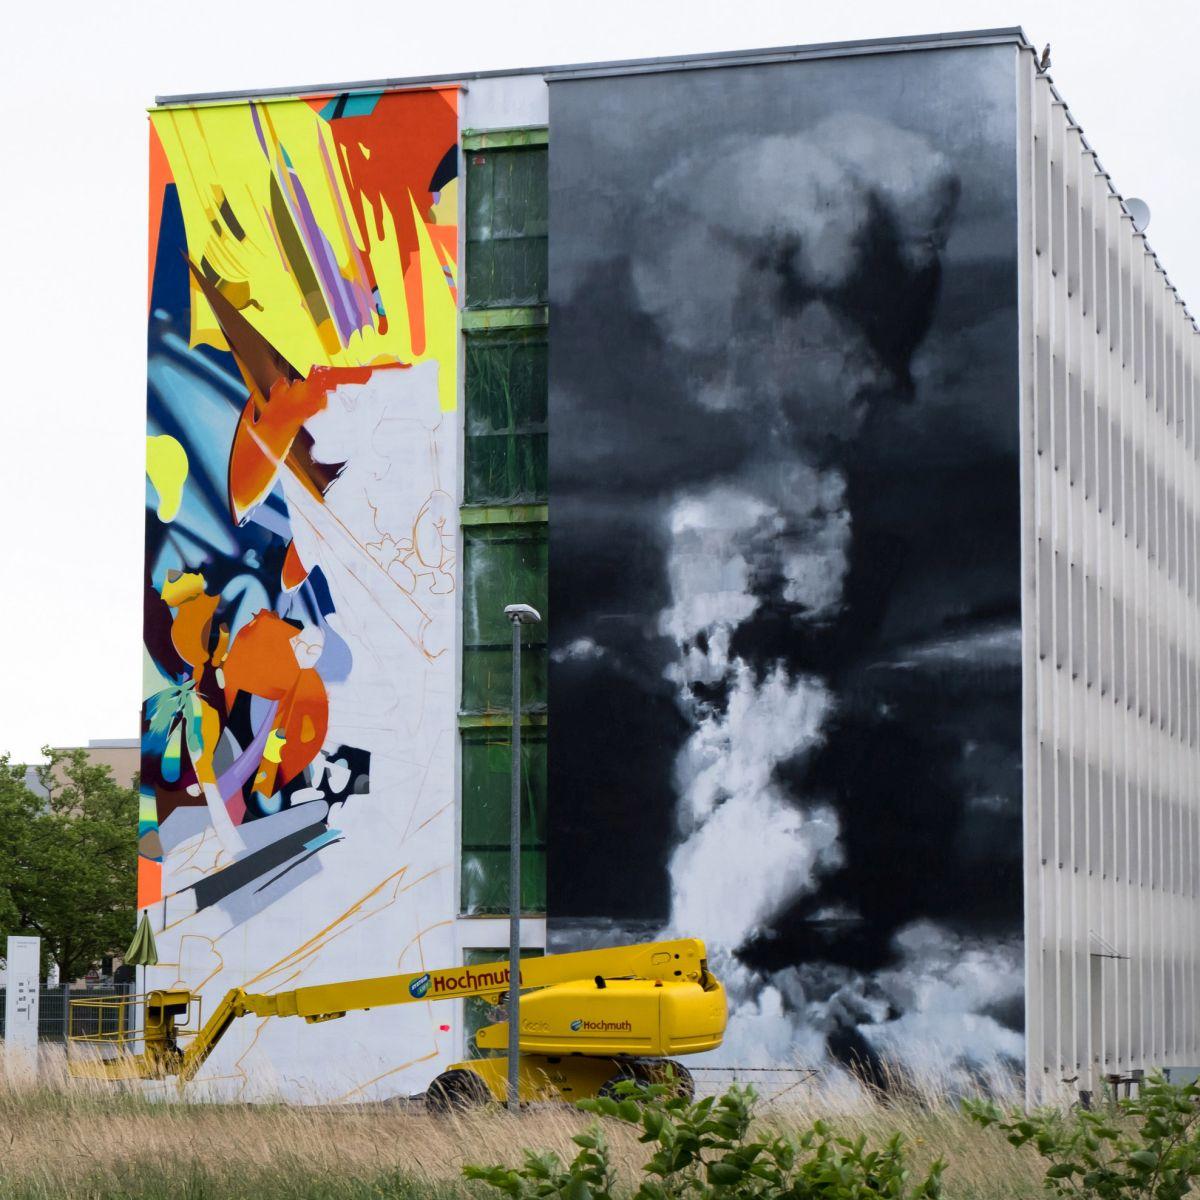 Hochmuth Teleskopbühne für Scale-Wall-Art-Festival